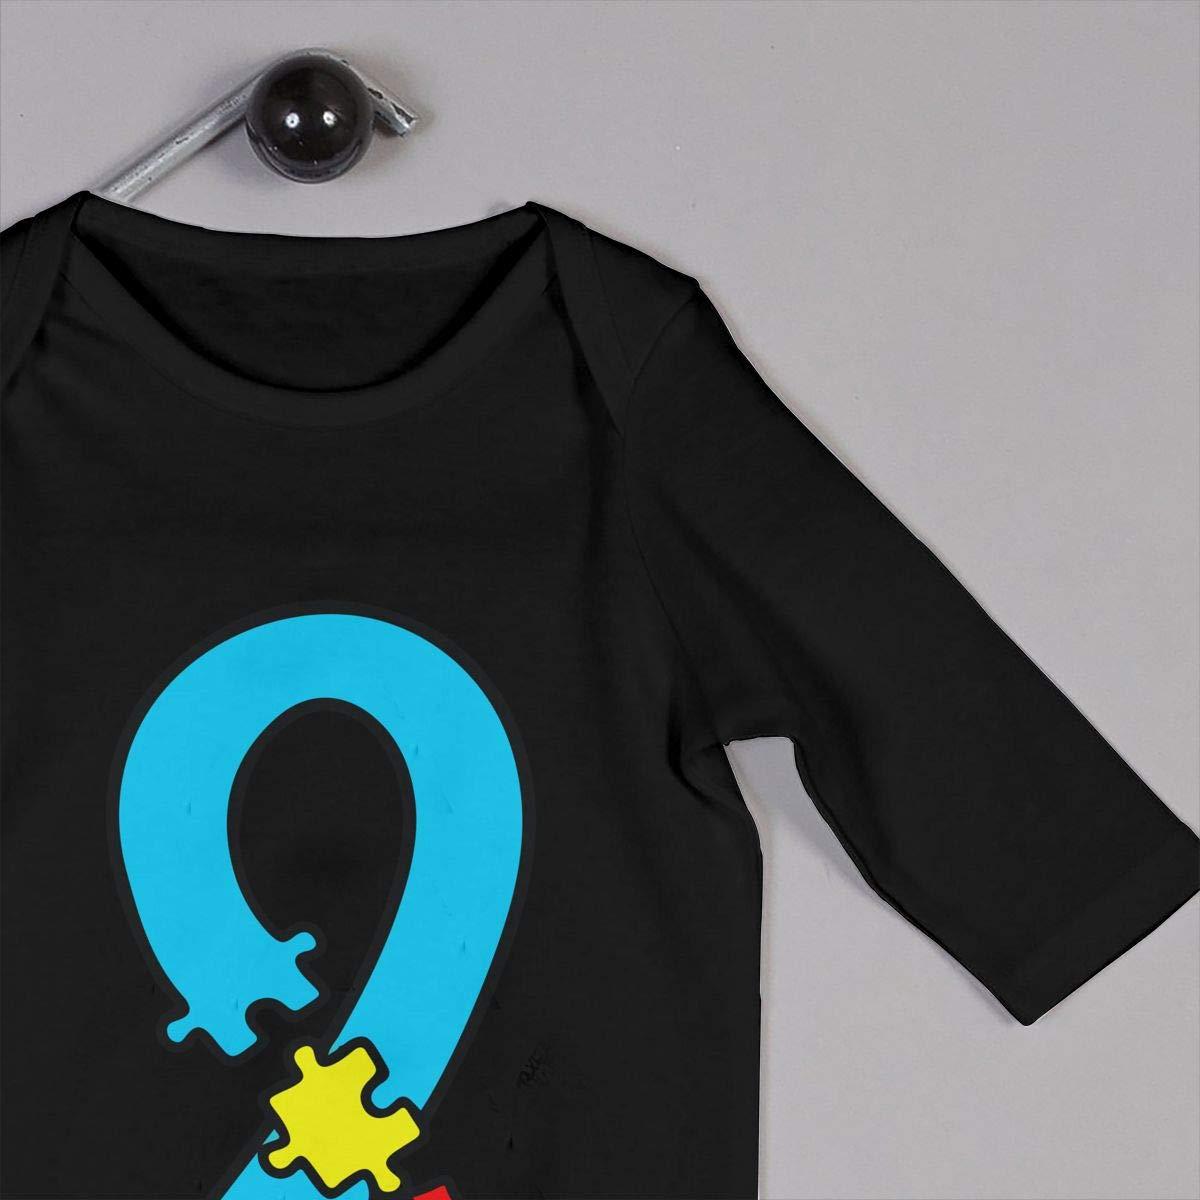 U99oi-9 Long Sleeve Cotton Bodysuit for Unisex Baby Soft Autism Awareness Jumpsuit